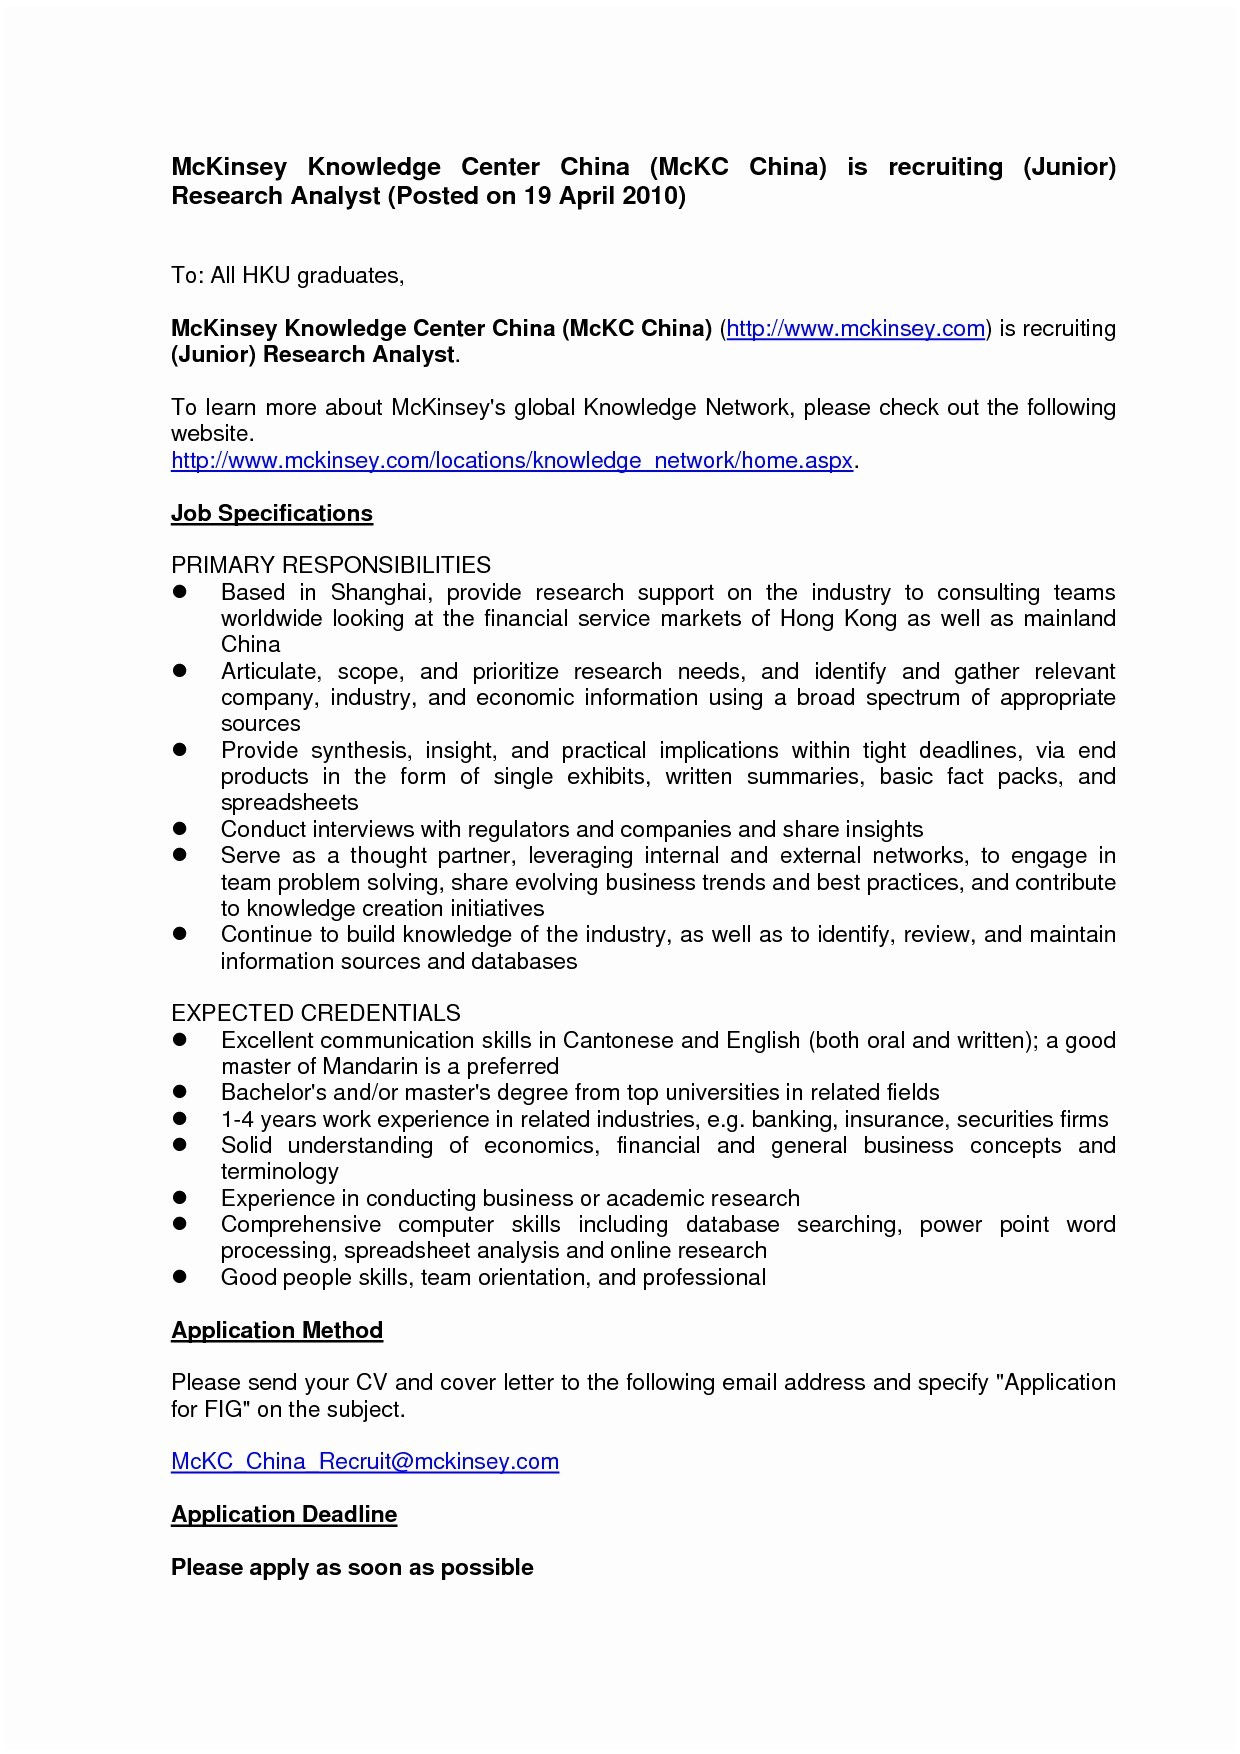 Letter for Job Offer Template - Job Fer Letter Template Us Copy Od Consultant Cover Letter Fungram